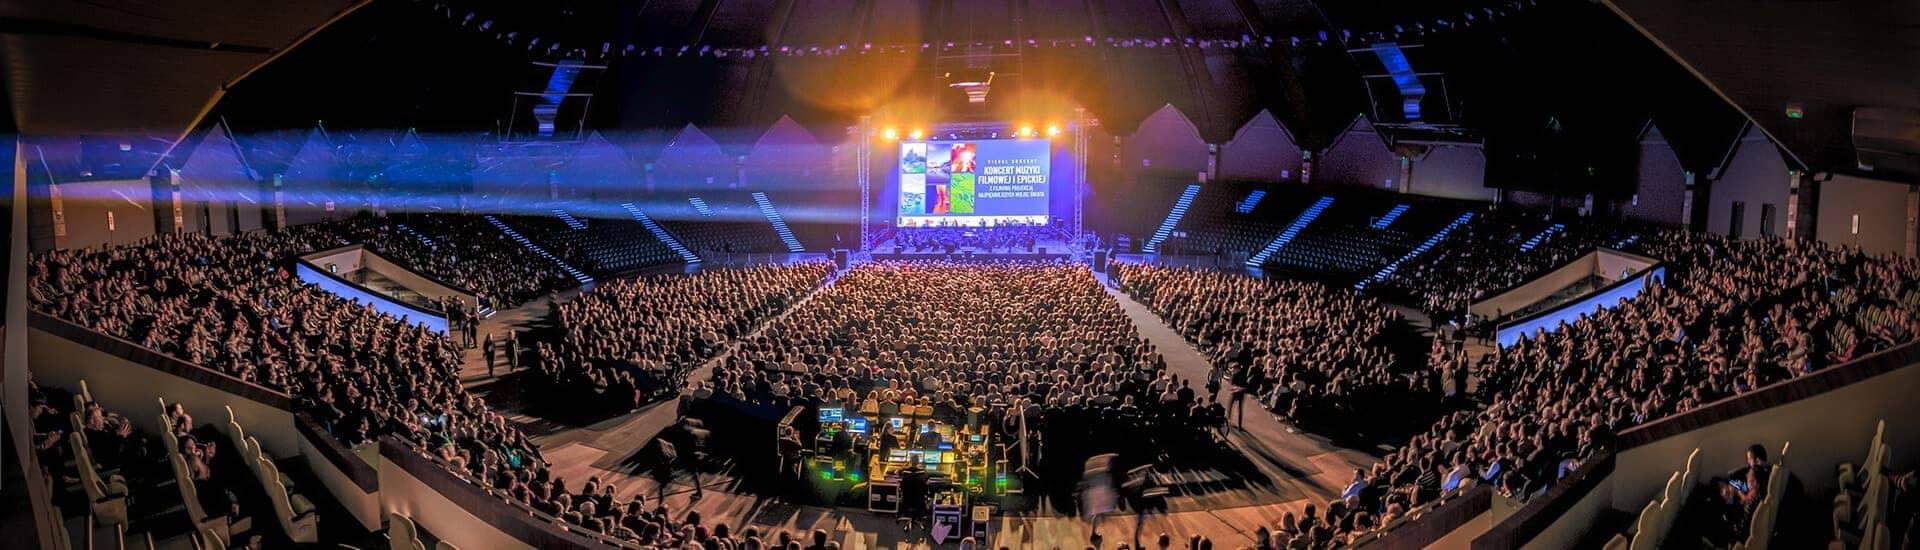 arena-pozna-visual-concert-min-min